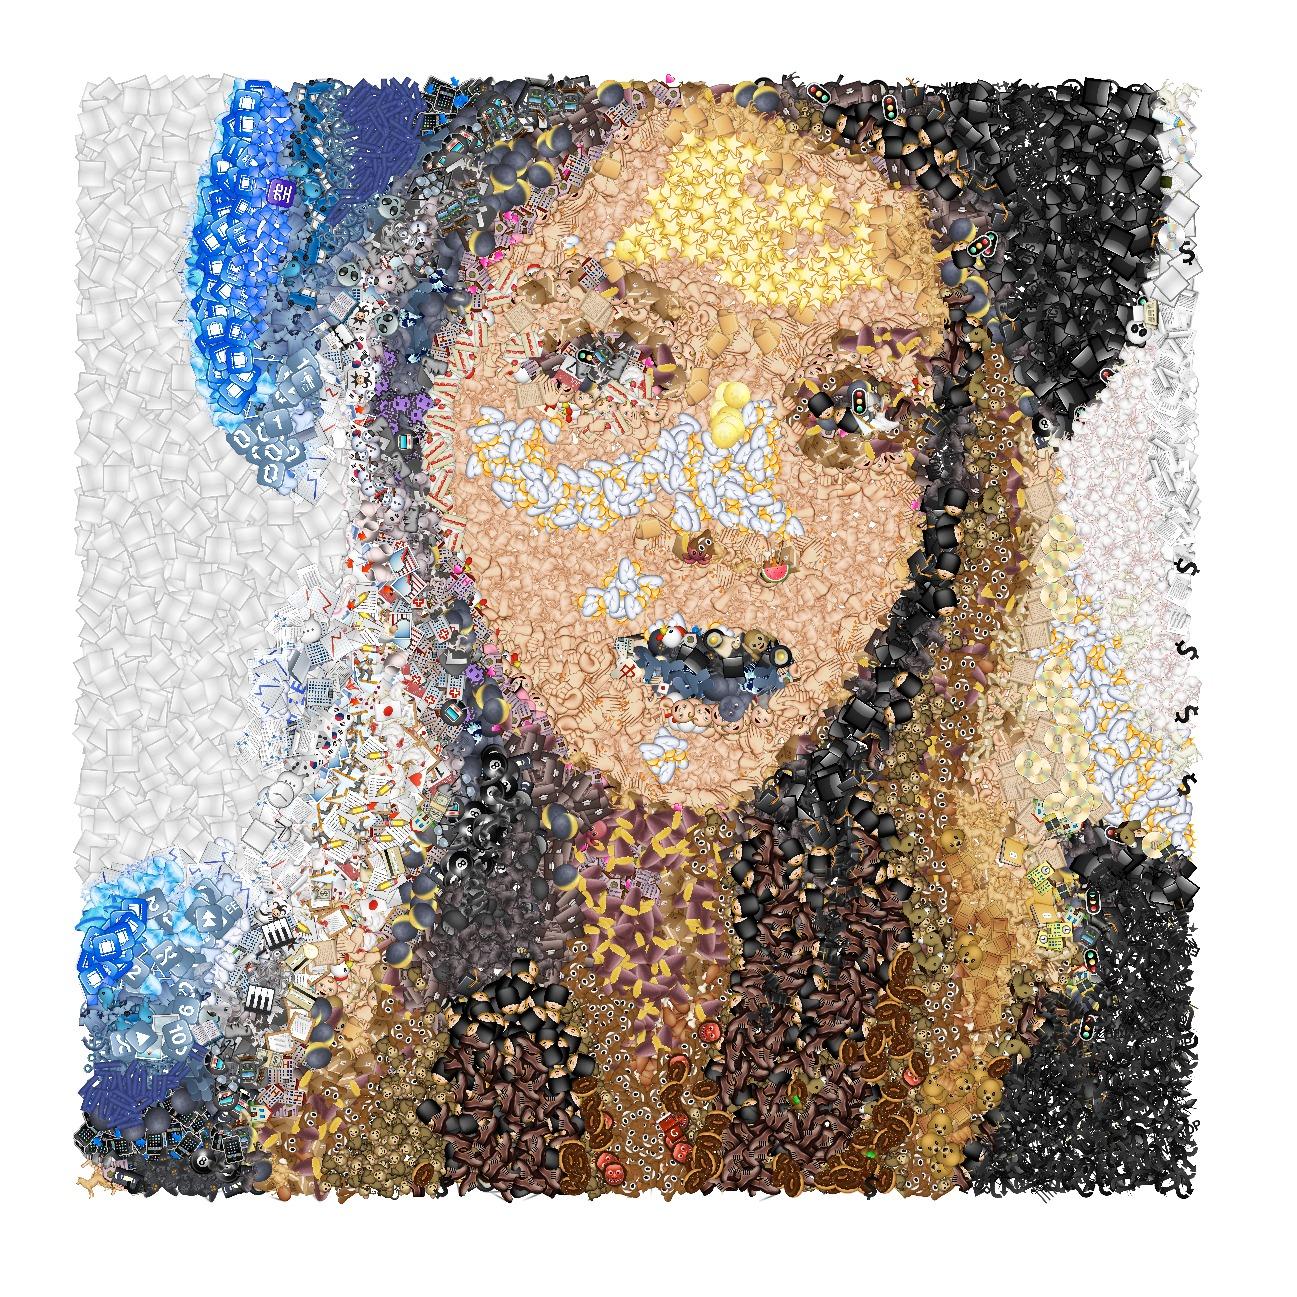 Turn picture into emoji